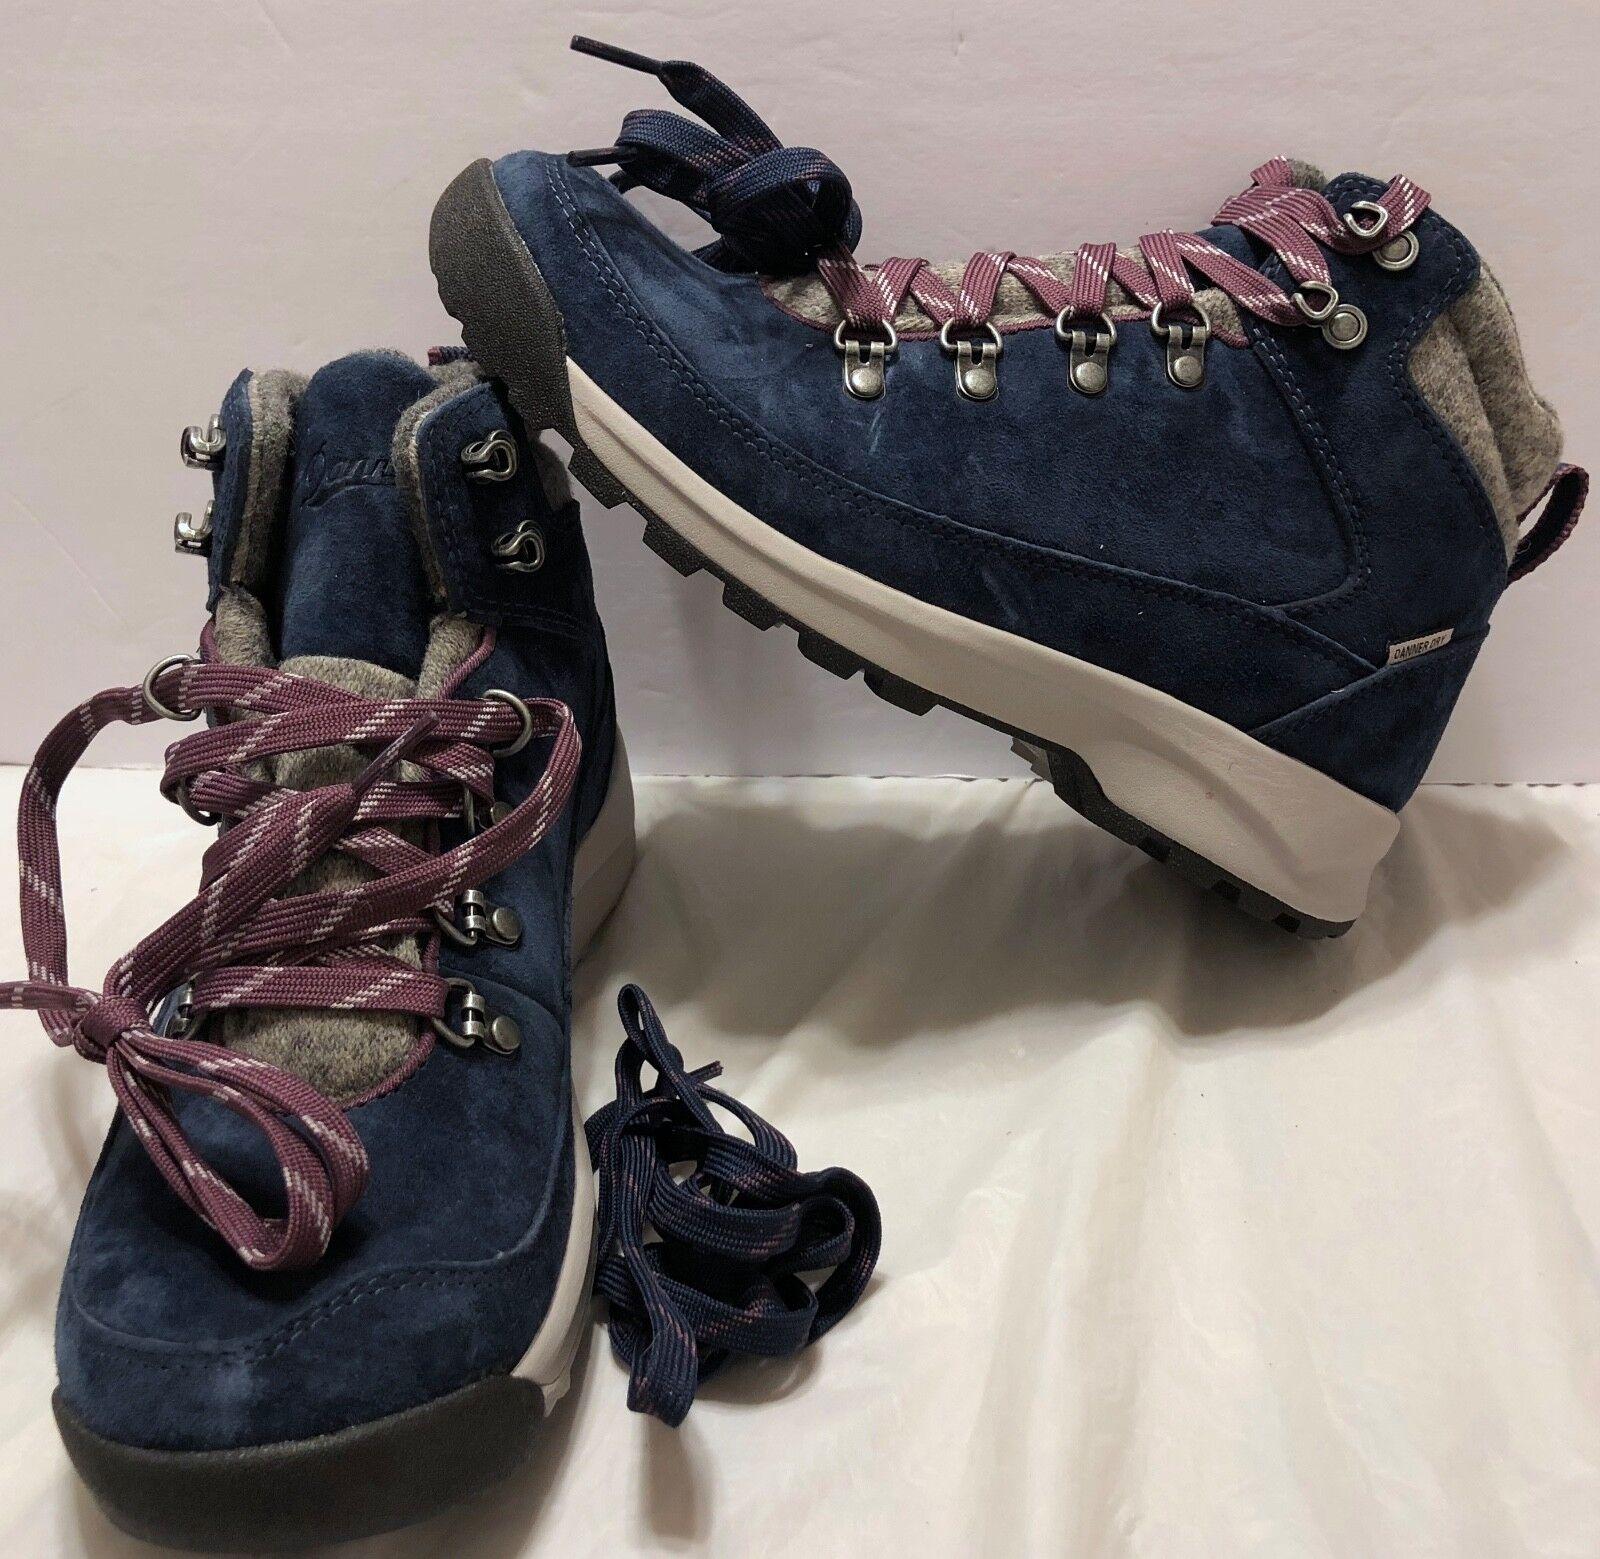 NWOB Danner Adriker Hiker Wool Navy Purple Stiefel Sz Sz Sz 7 Primaloft Danner Dry Hike c87ea1